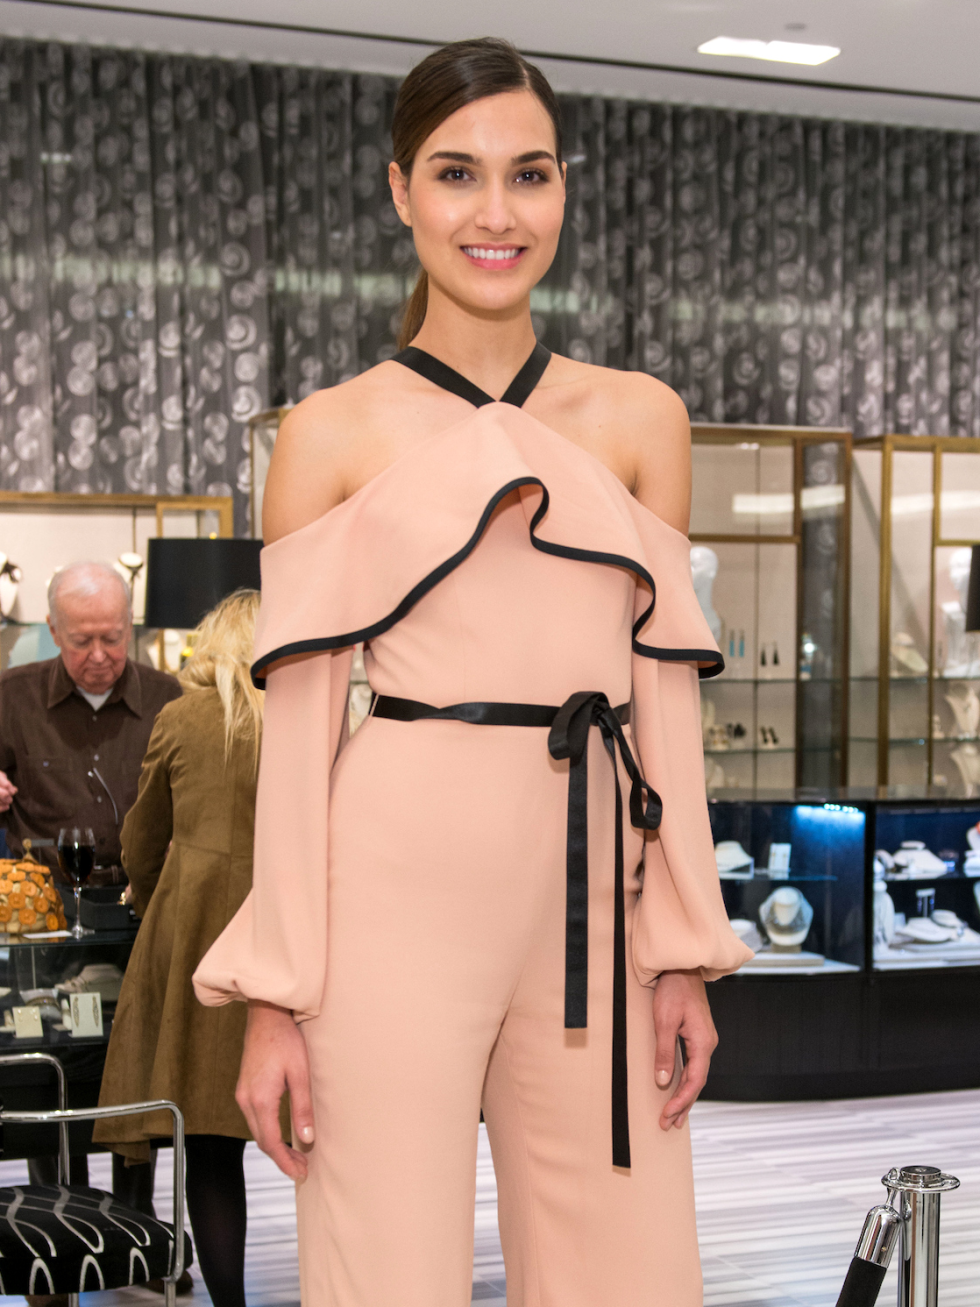 Houston, Latin Women's Initiative Fashion Show and Luncheon, feb 2017, Tootsies Model